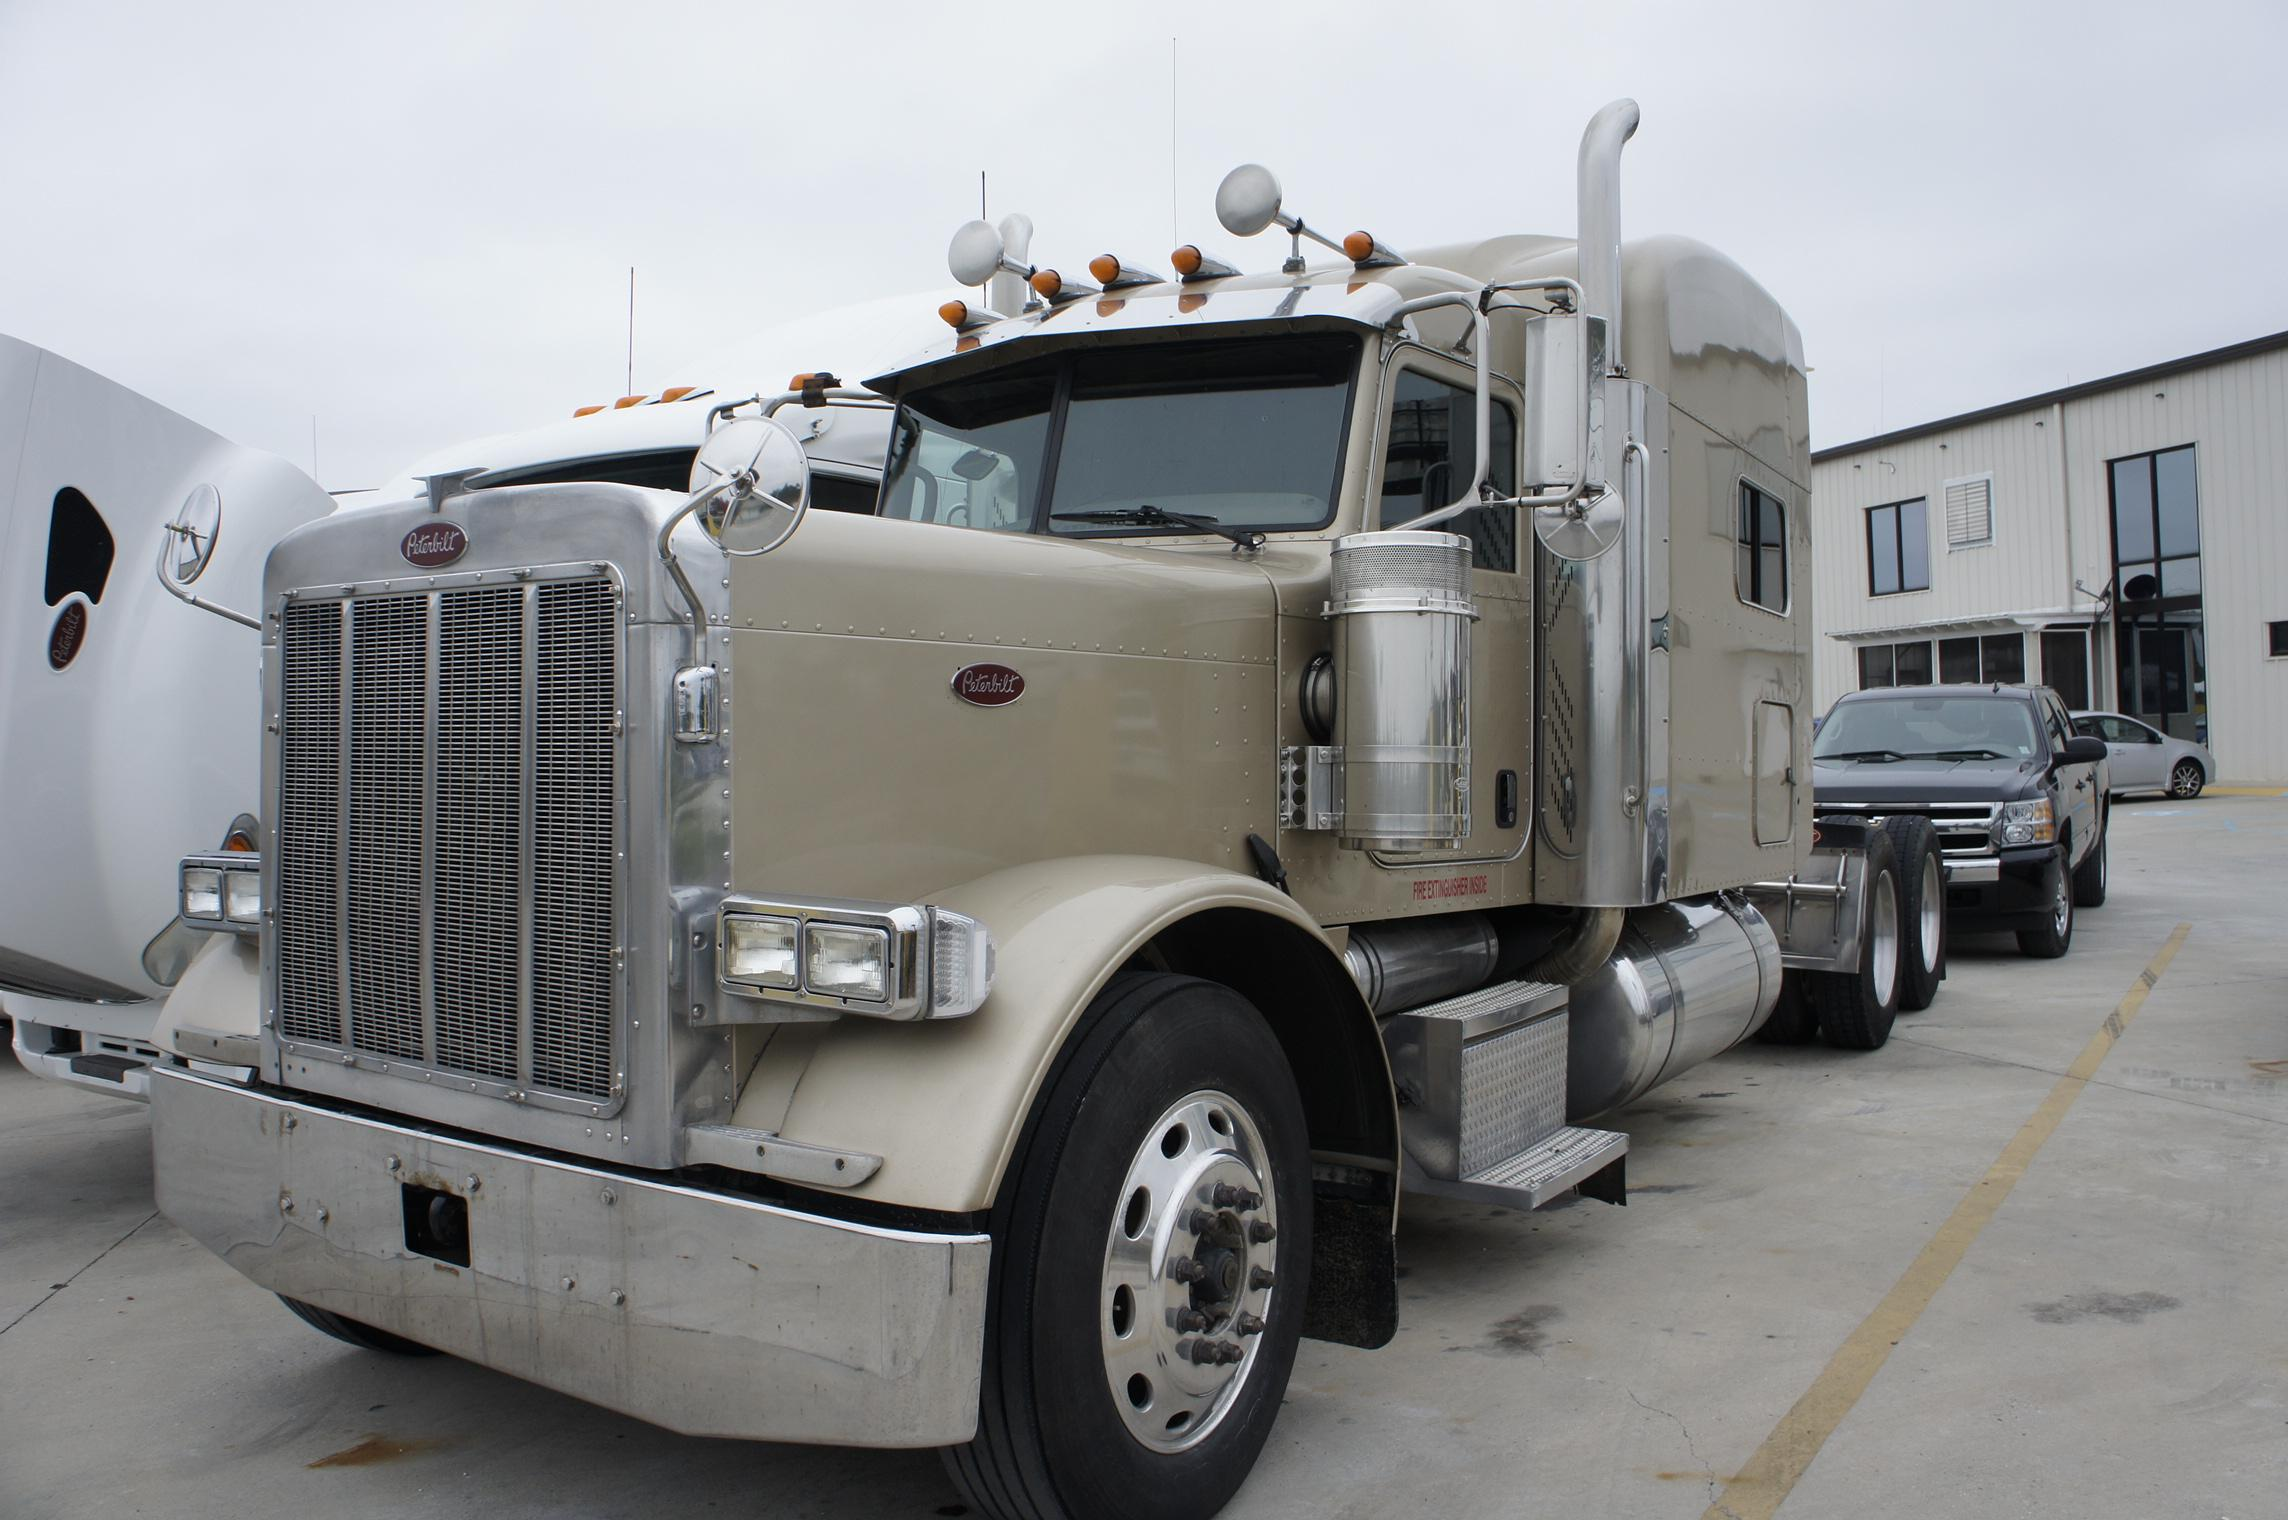 USED 2007 PETERBILT 379EXHD SLEEPER TRUCK #86921